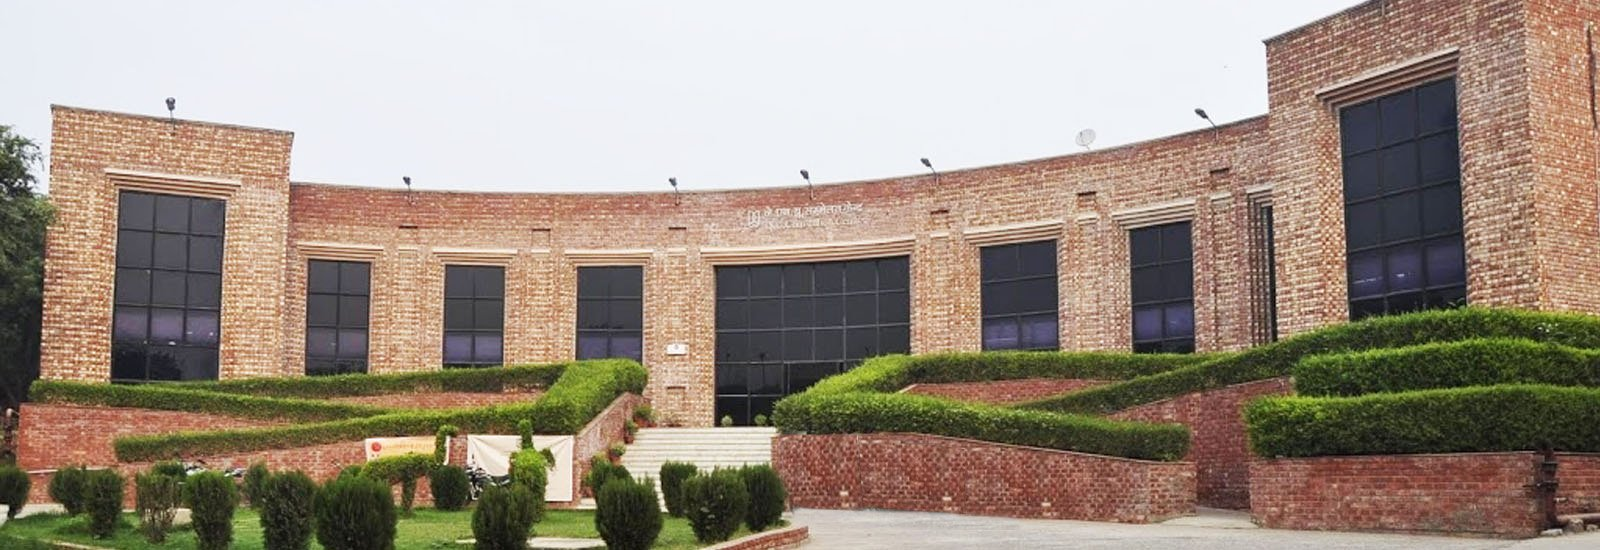 Jawaharlal Nehru University Admission 2018